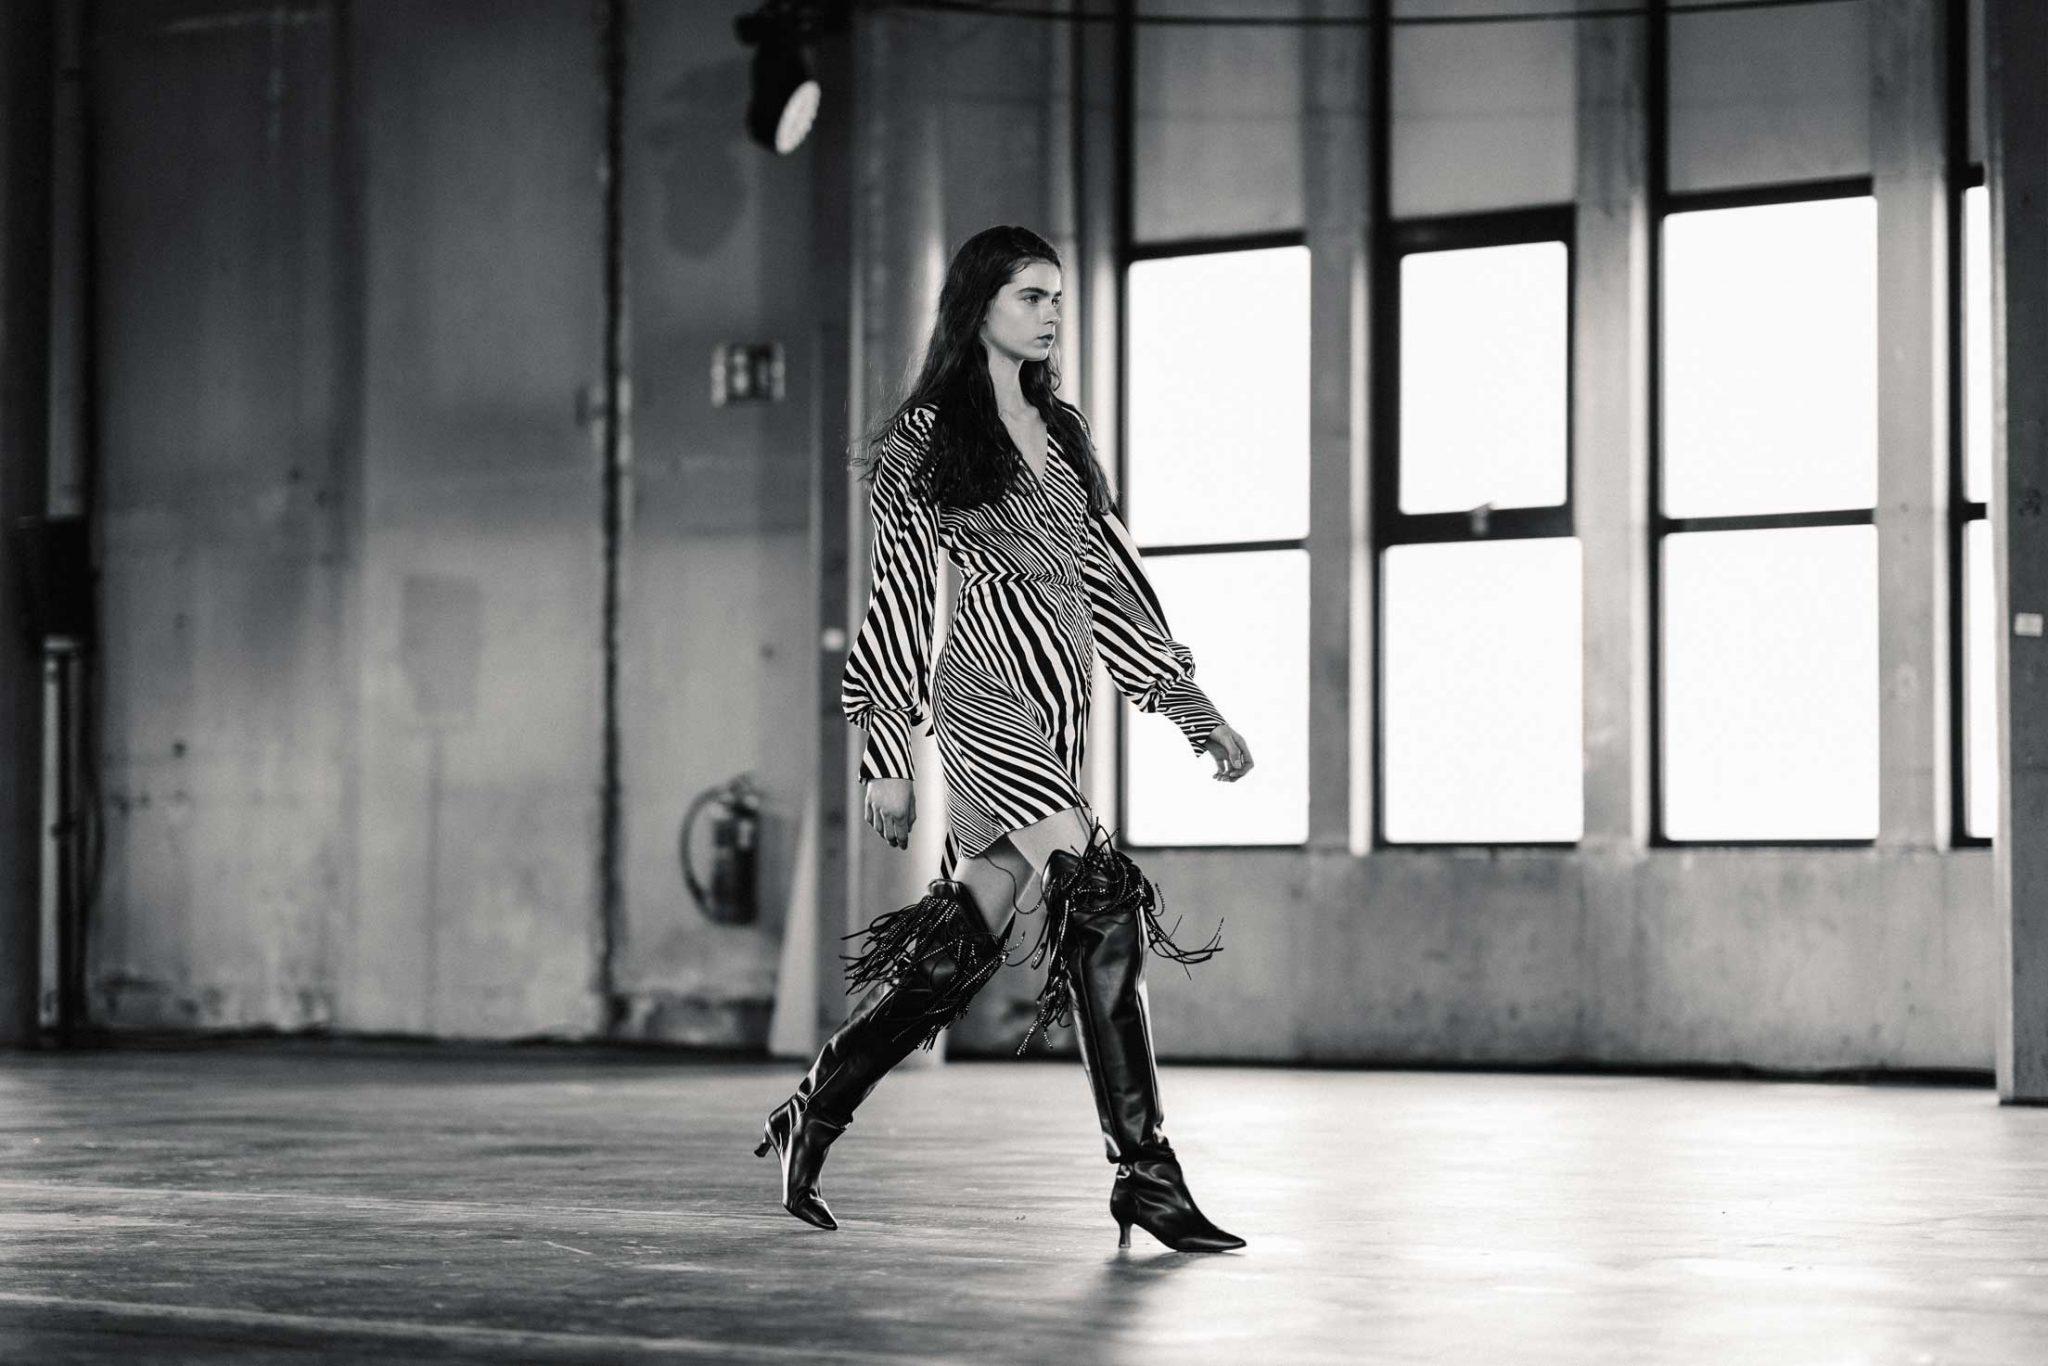 Ilsoo_van_Dijk_Ilsoovandijk_AFW_Toral_Backstage_Amsterdam_Fashion_week_2020_-scaled_10